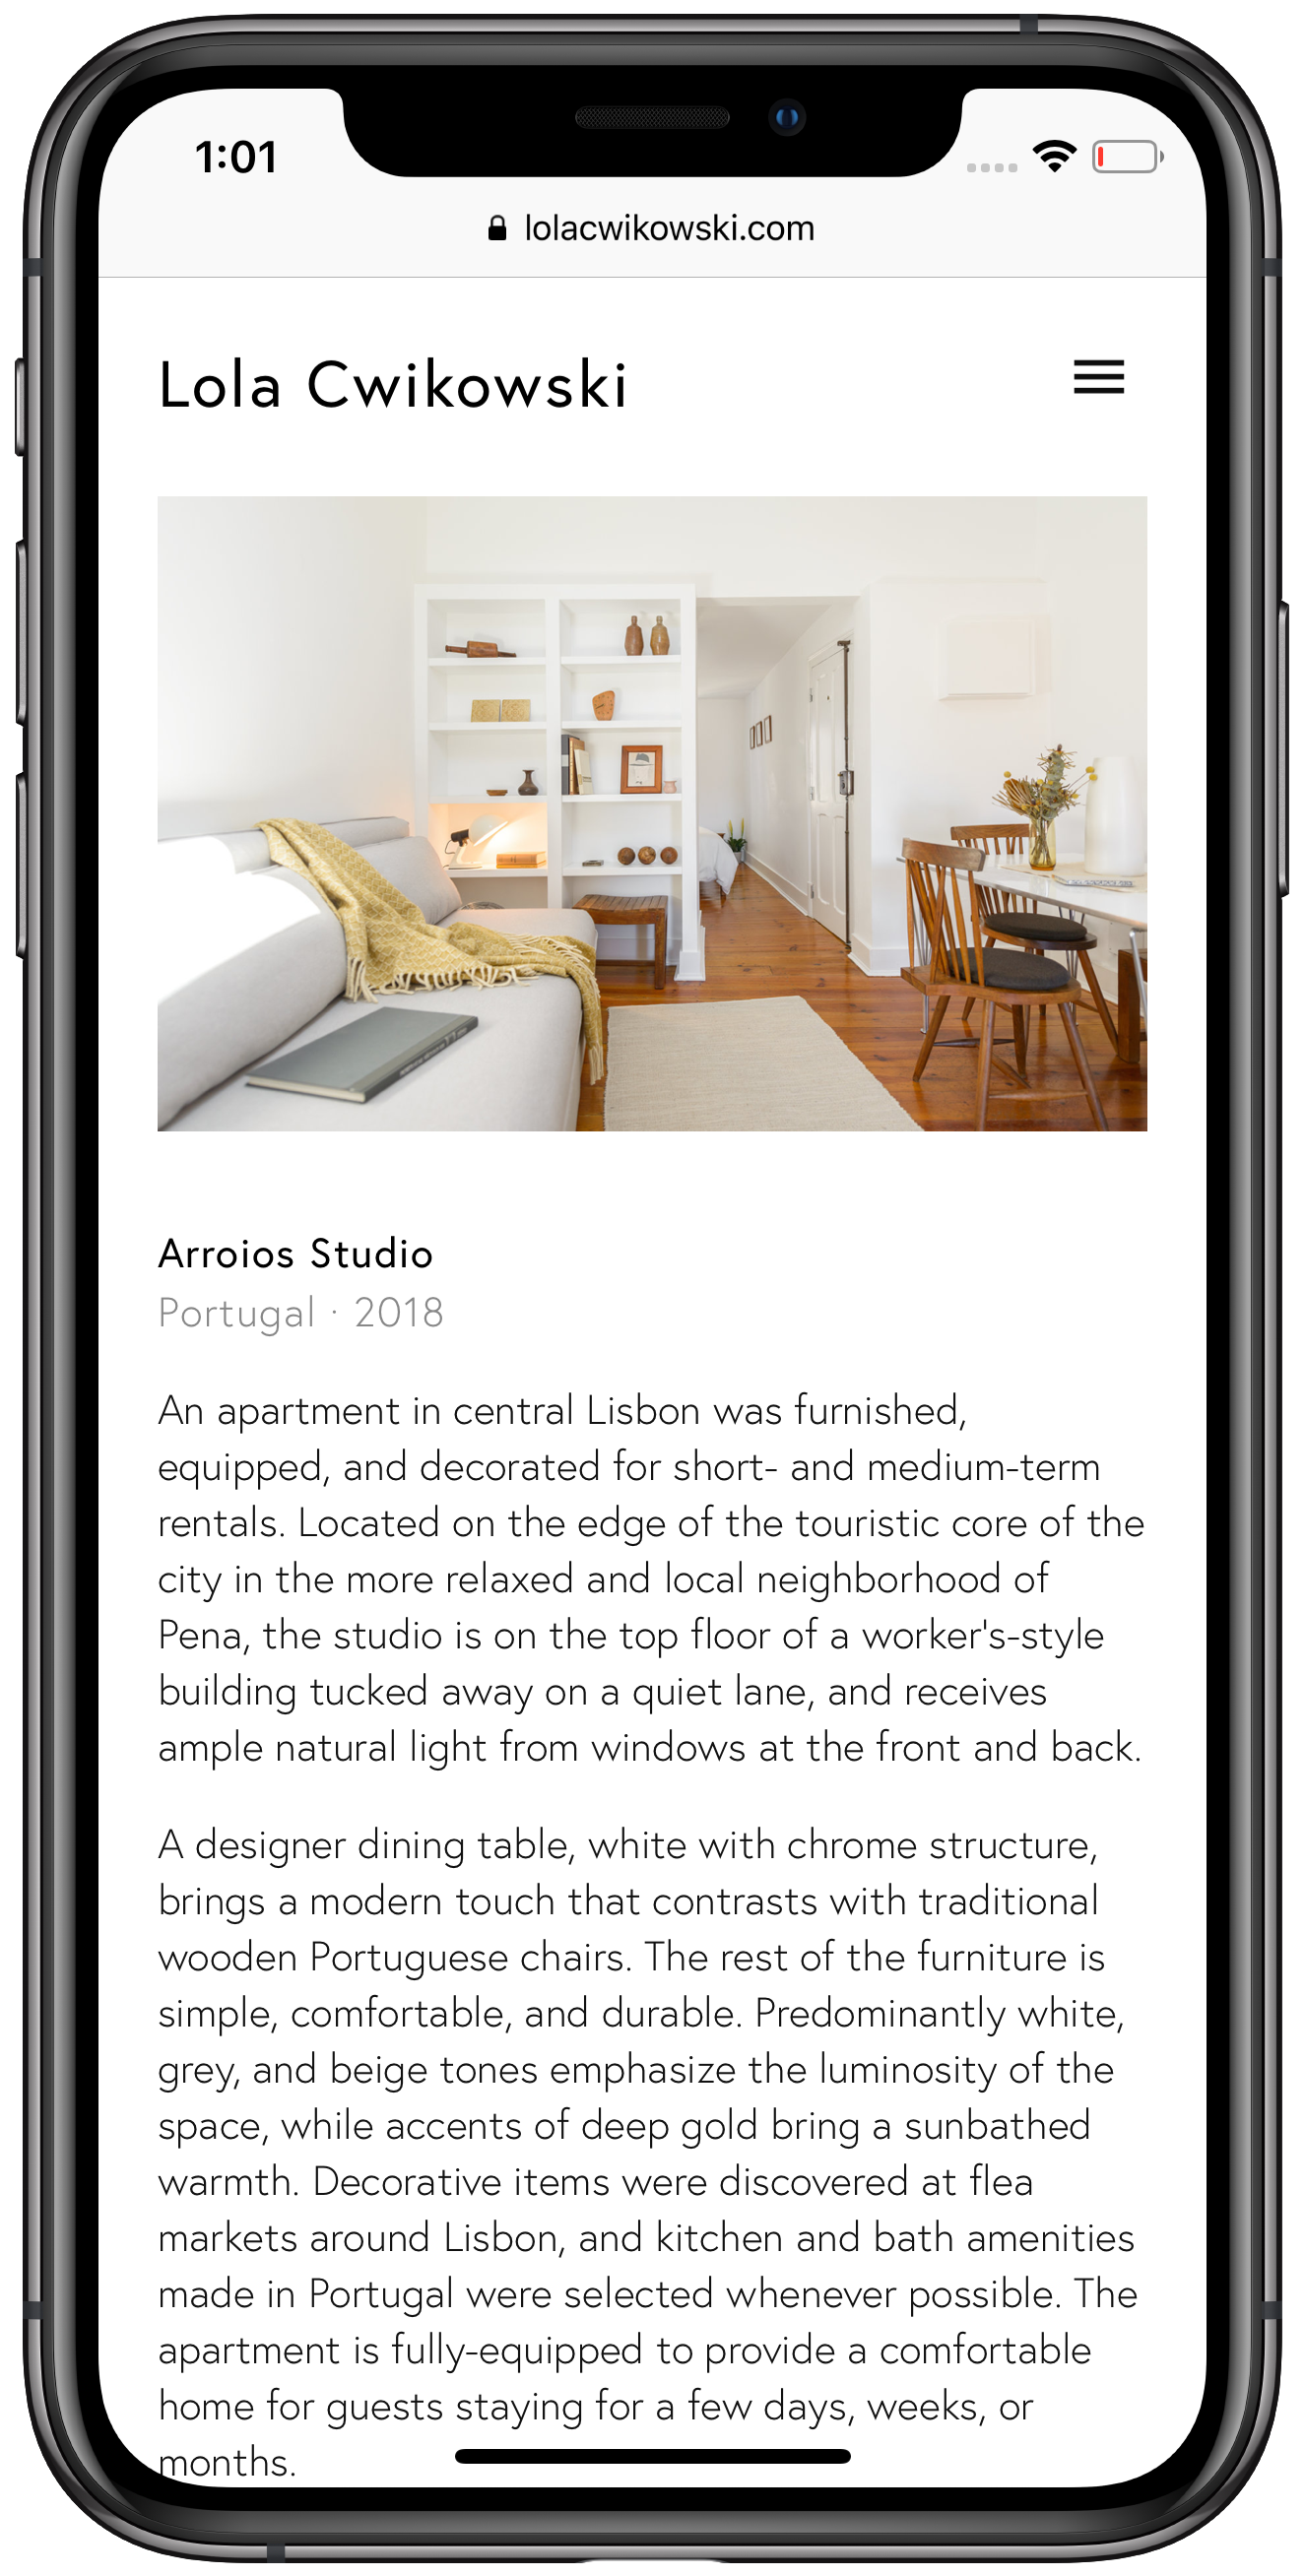 Screen capture of Lola Cwikowski Interior Design Studio website, Arroios studio project